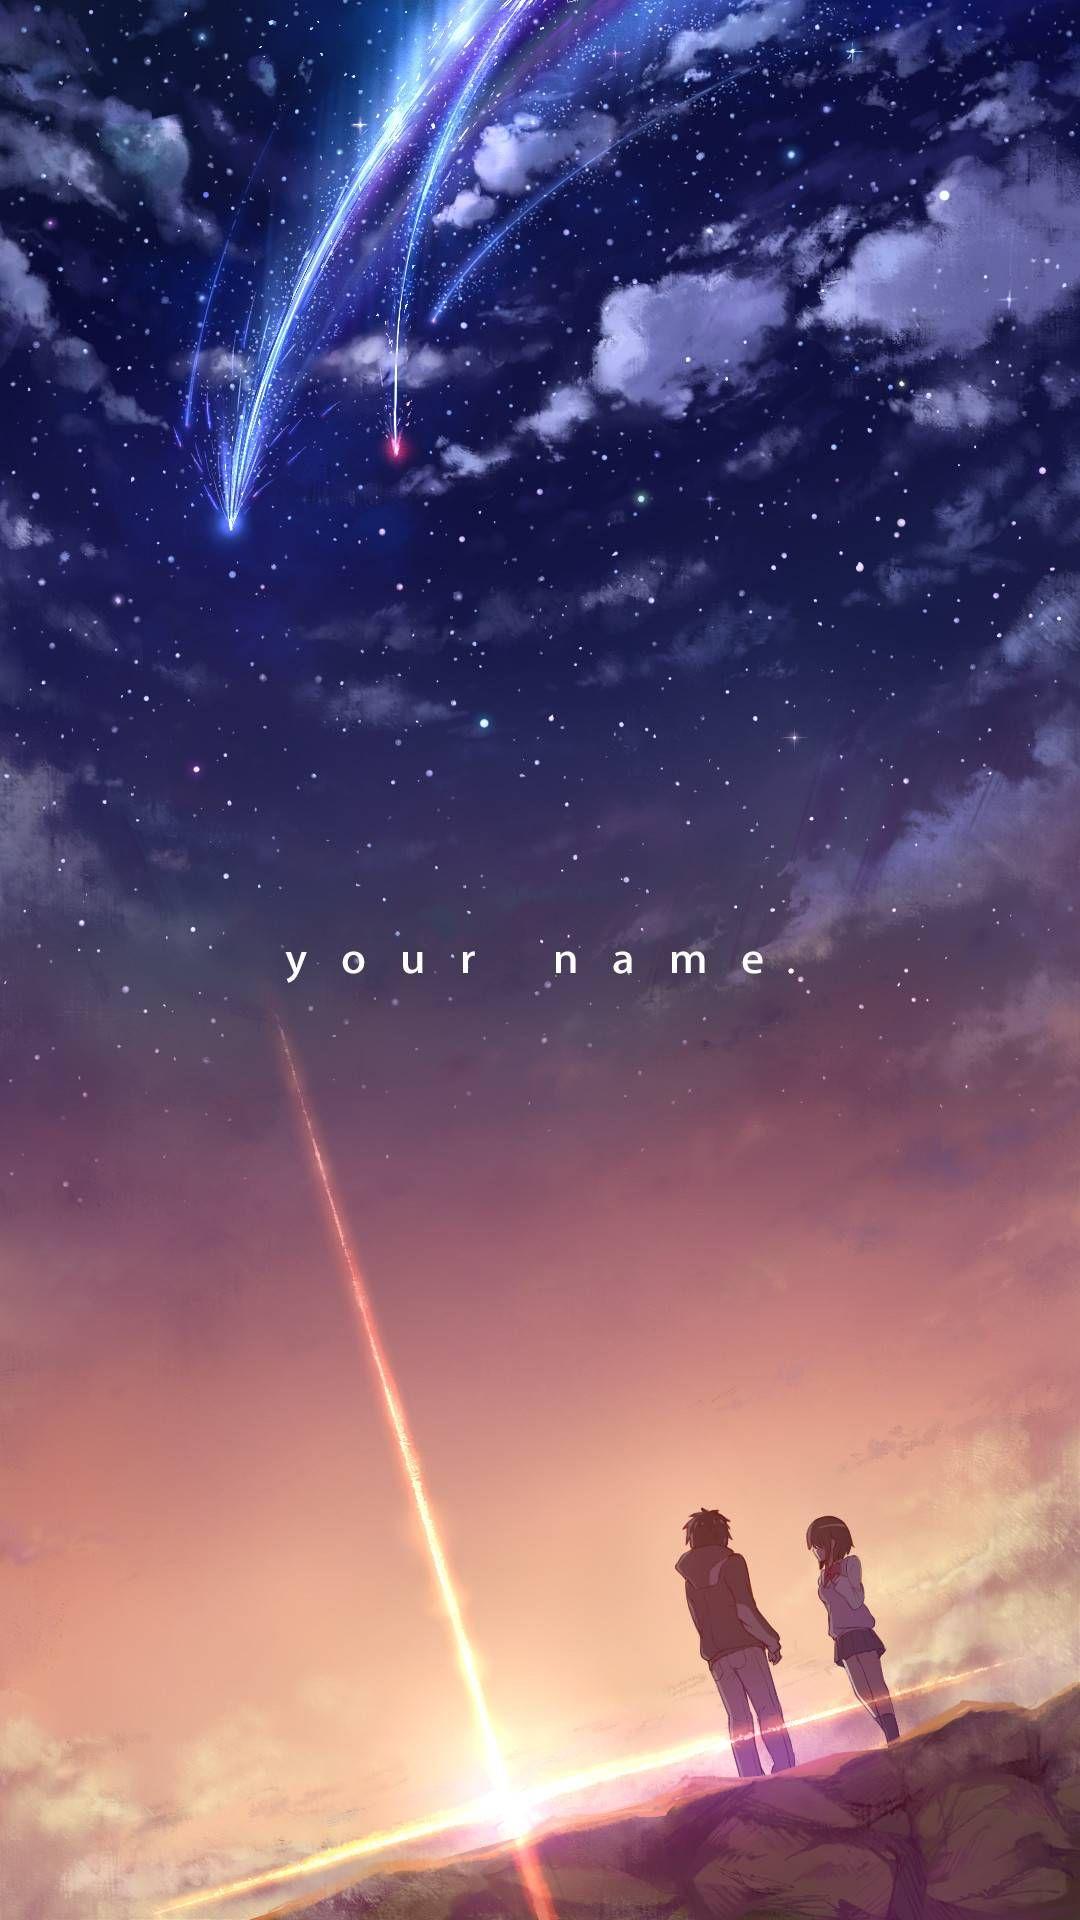 Your Name/Kimi no na wa | Anime | Kimi no na wa wallpaper, Kimi no na e Your name anime